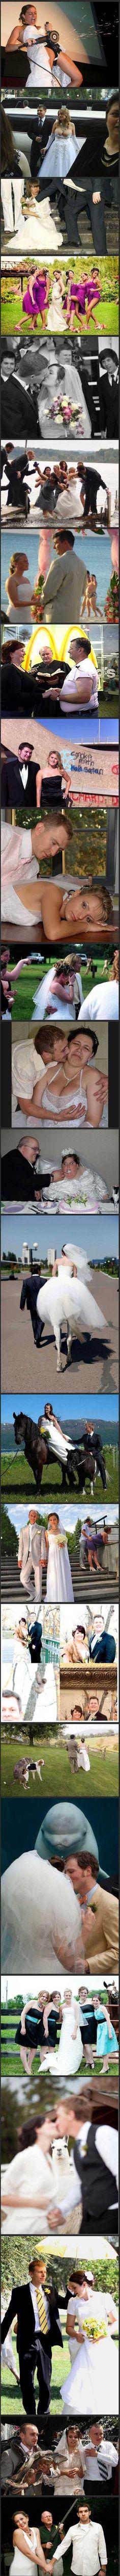 Mostly unfortunate wedding photos.